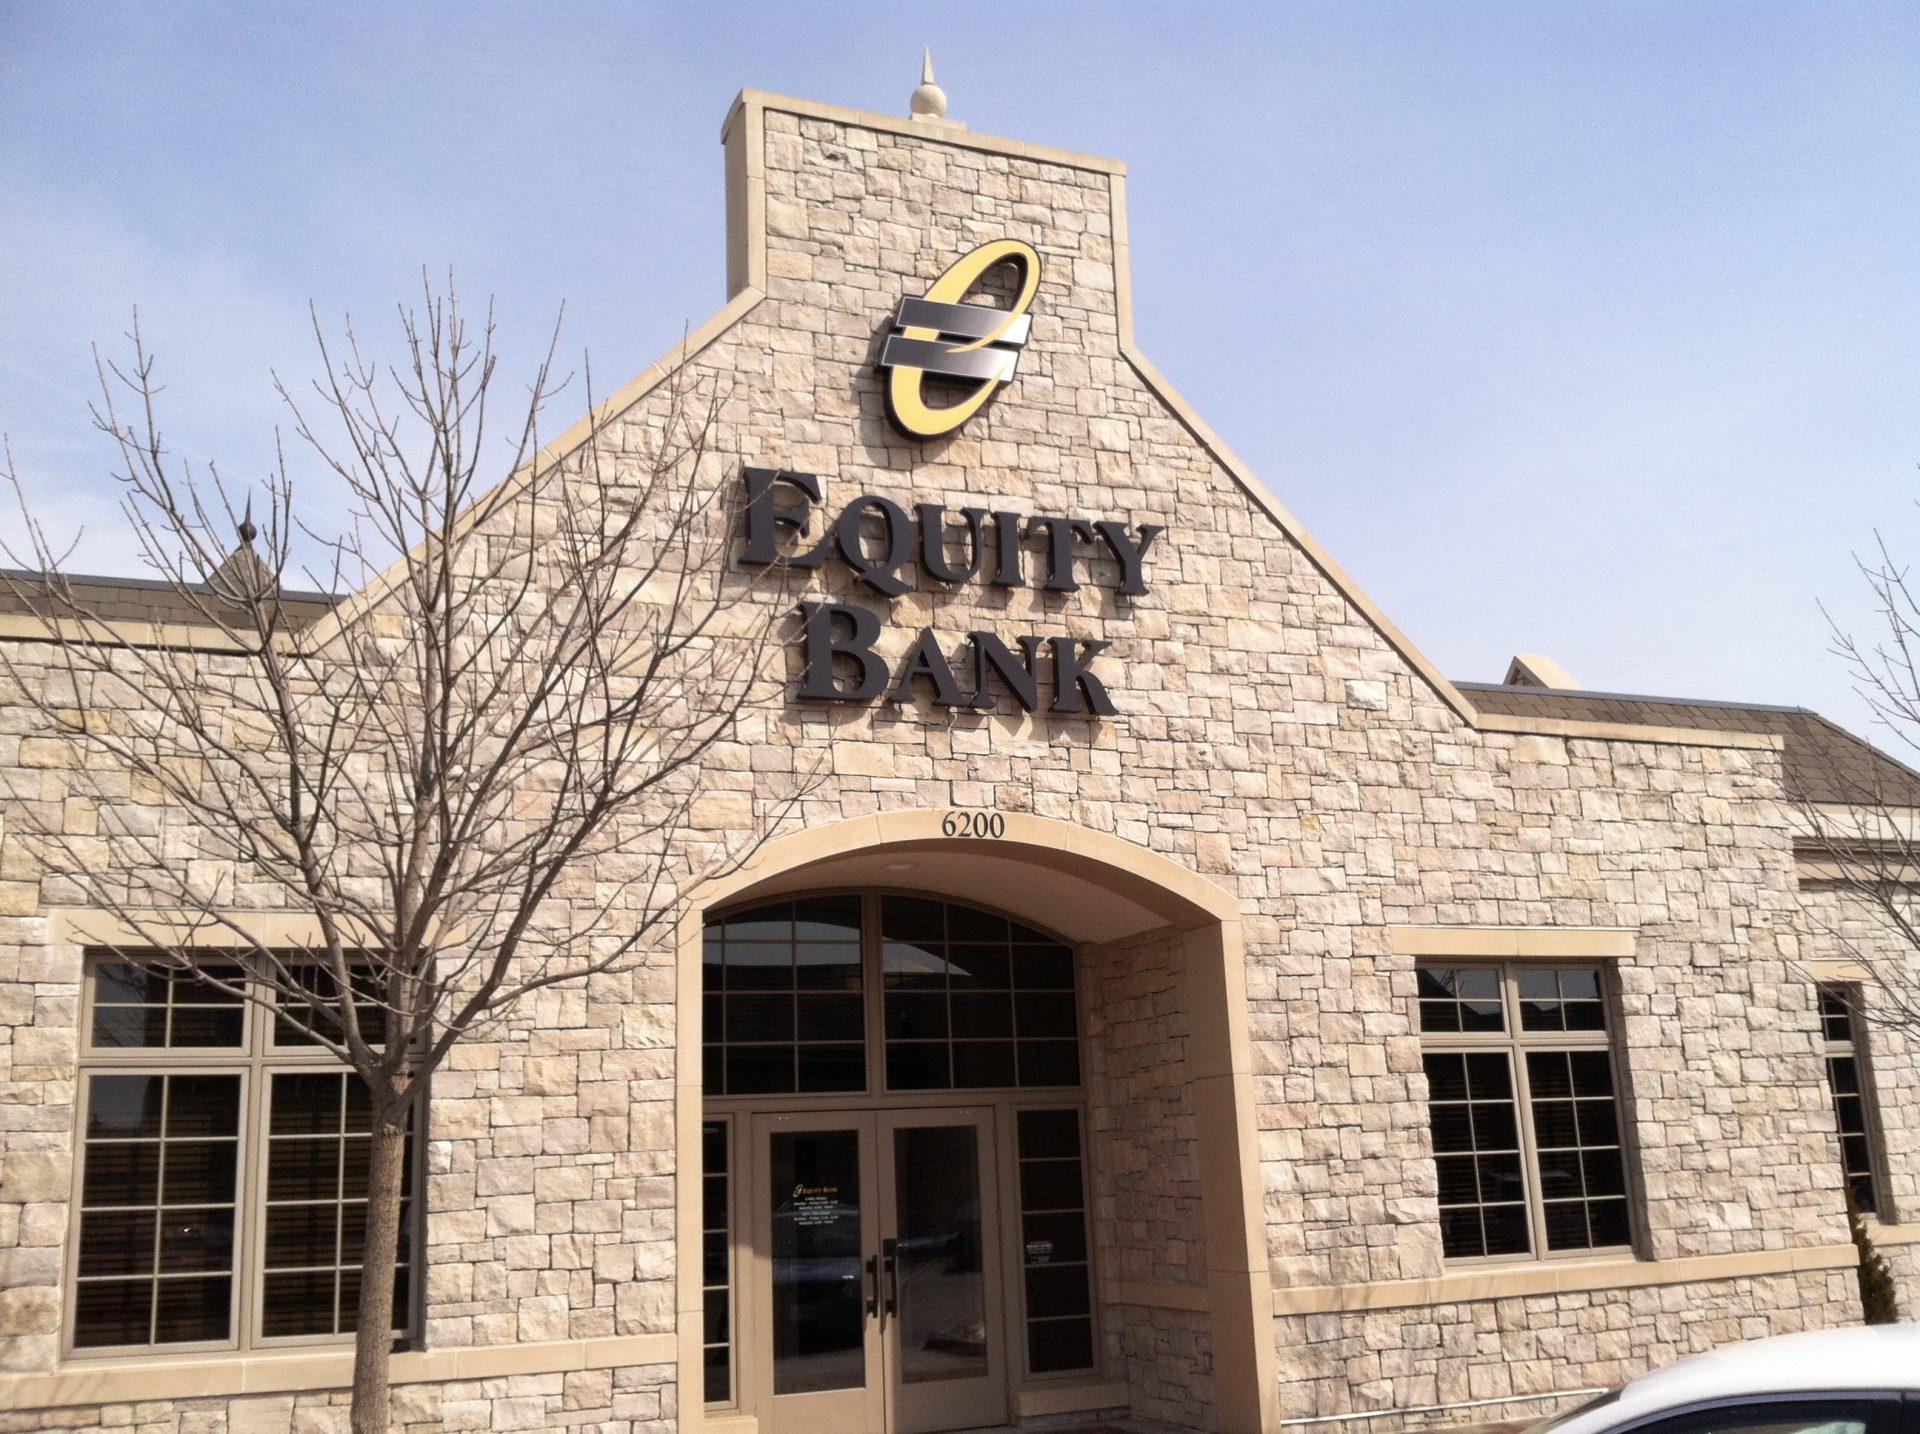 Equity Bank Kansas City Northland branch exterior.